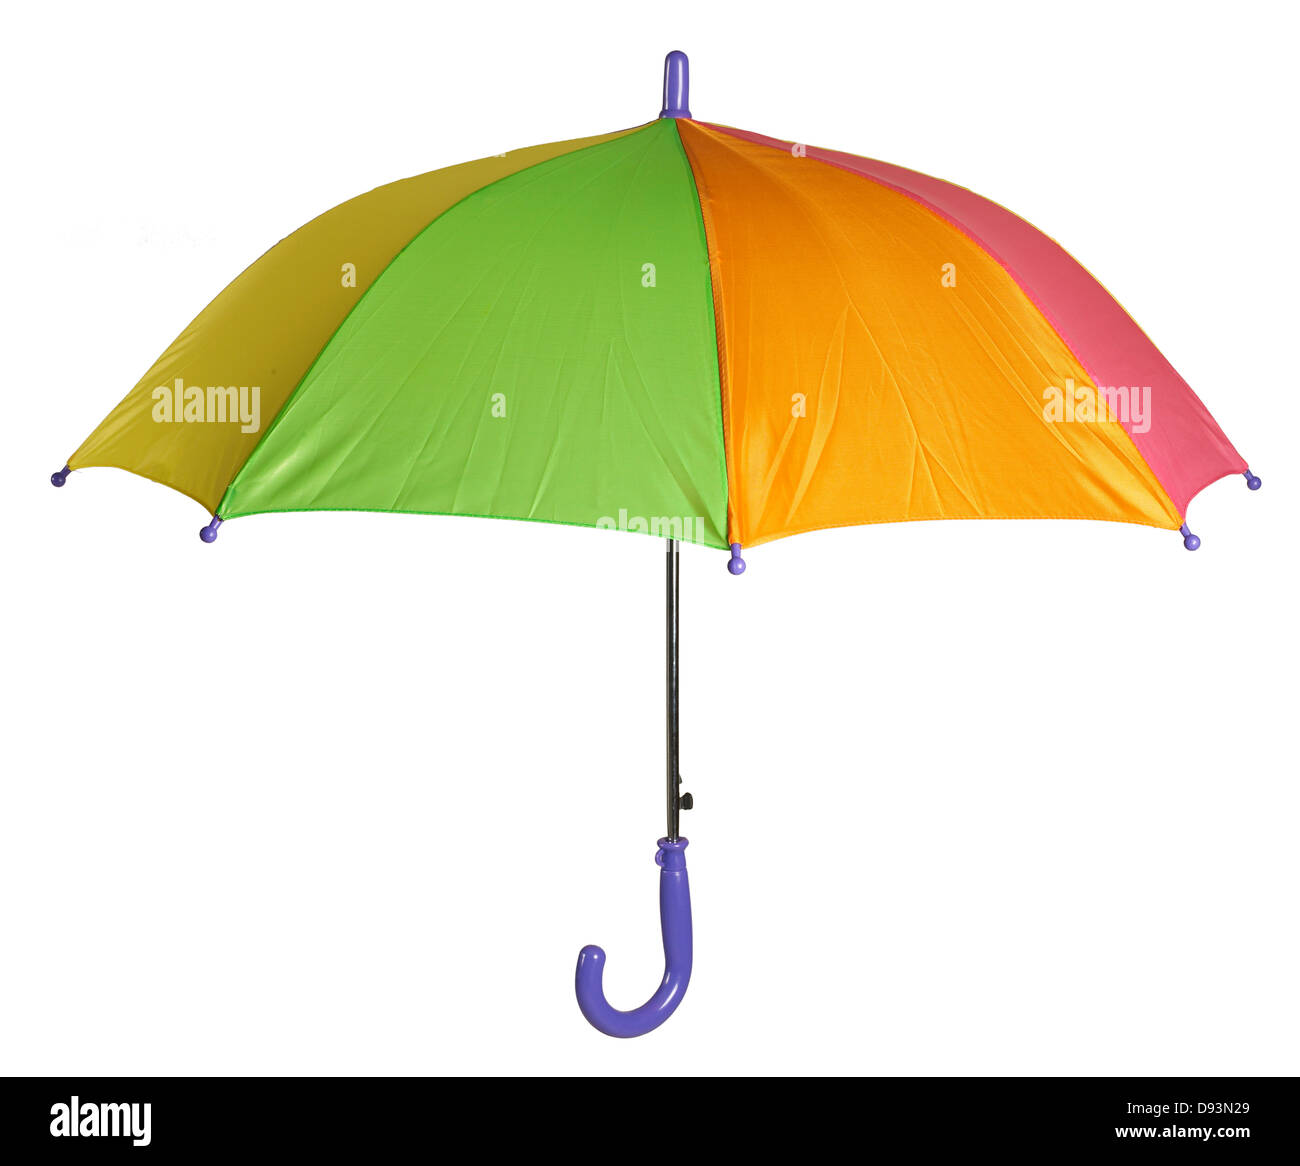 Umbrella Canopy Stock Photos & Umbrella Canopy Stock Images - Alamy